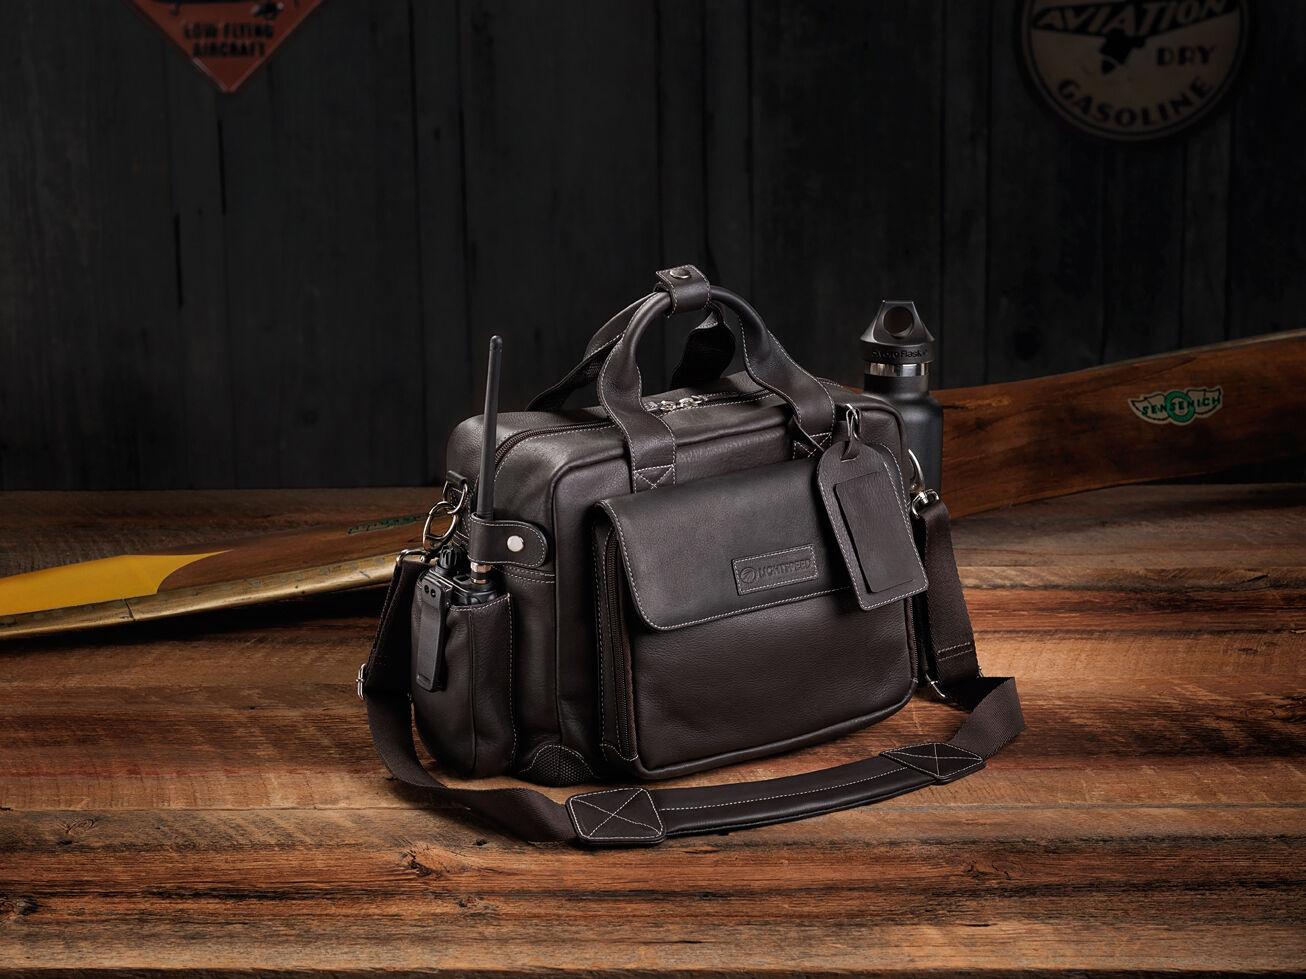 Lightspeed Adventure Flight Bag Collection - The Markham: Leather Flight Bag